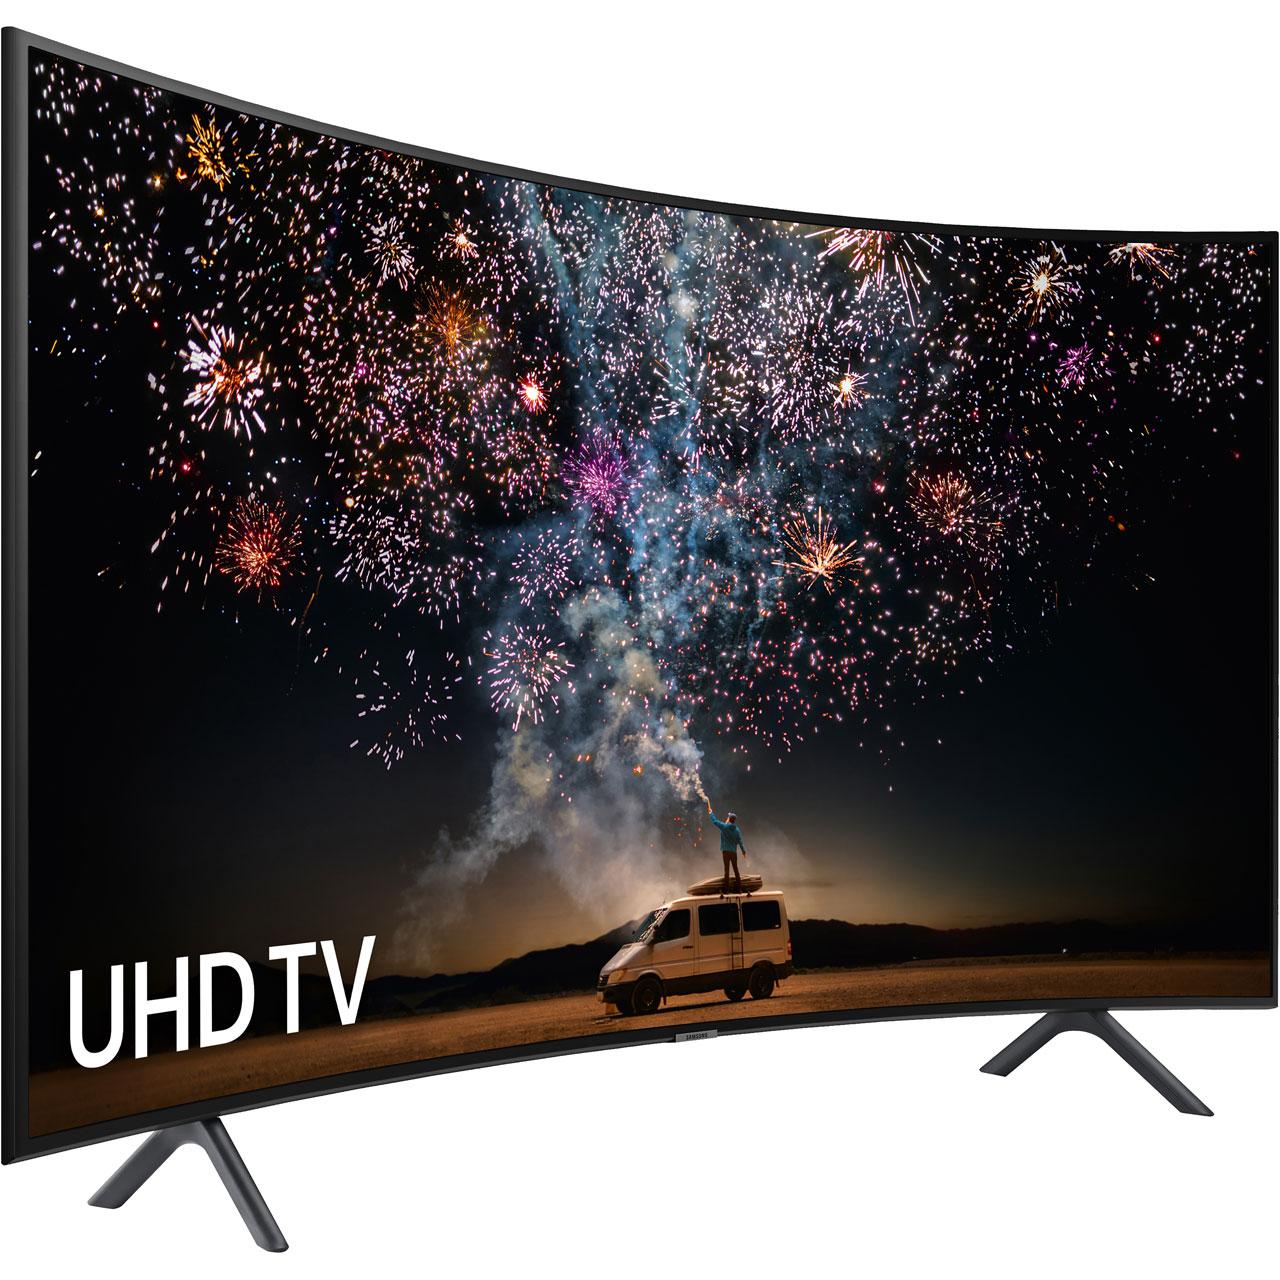 Samsung UE49RU7300 49